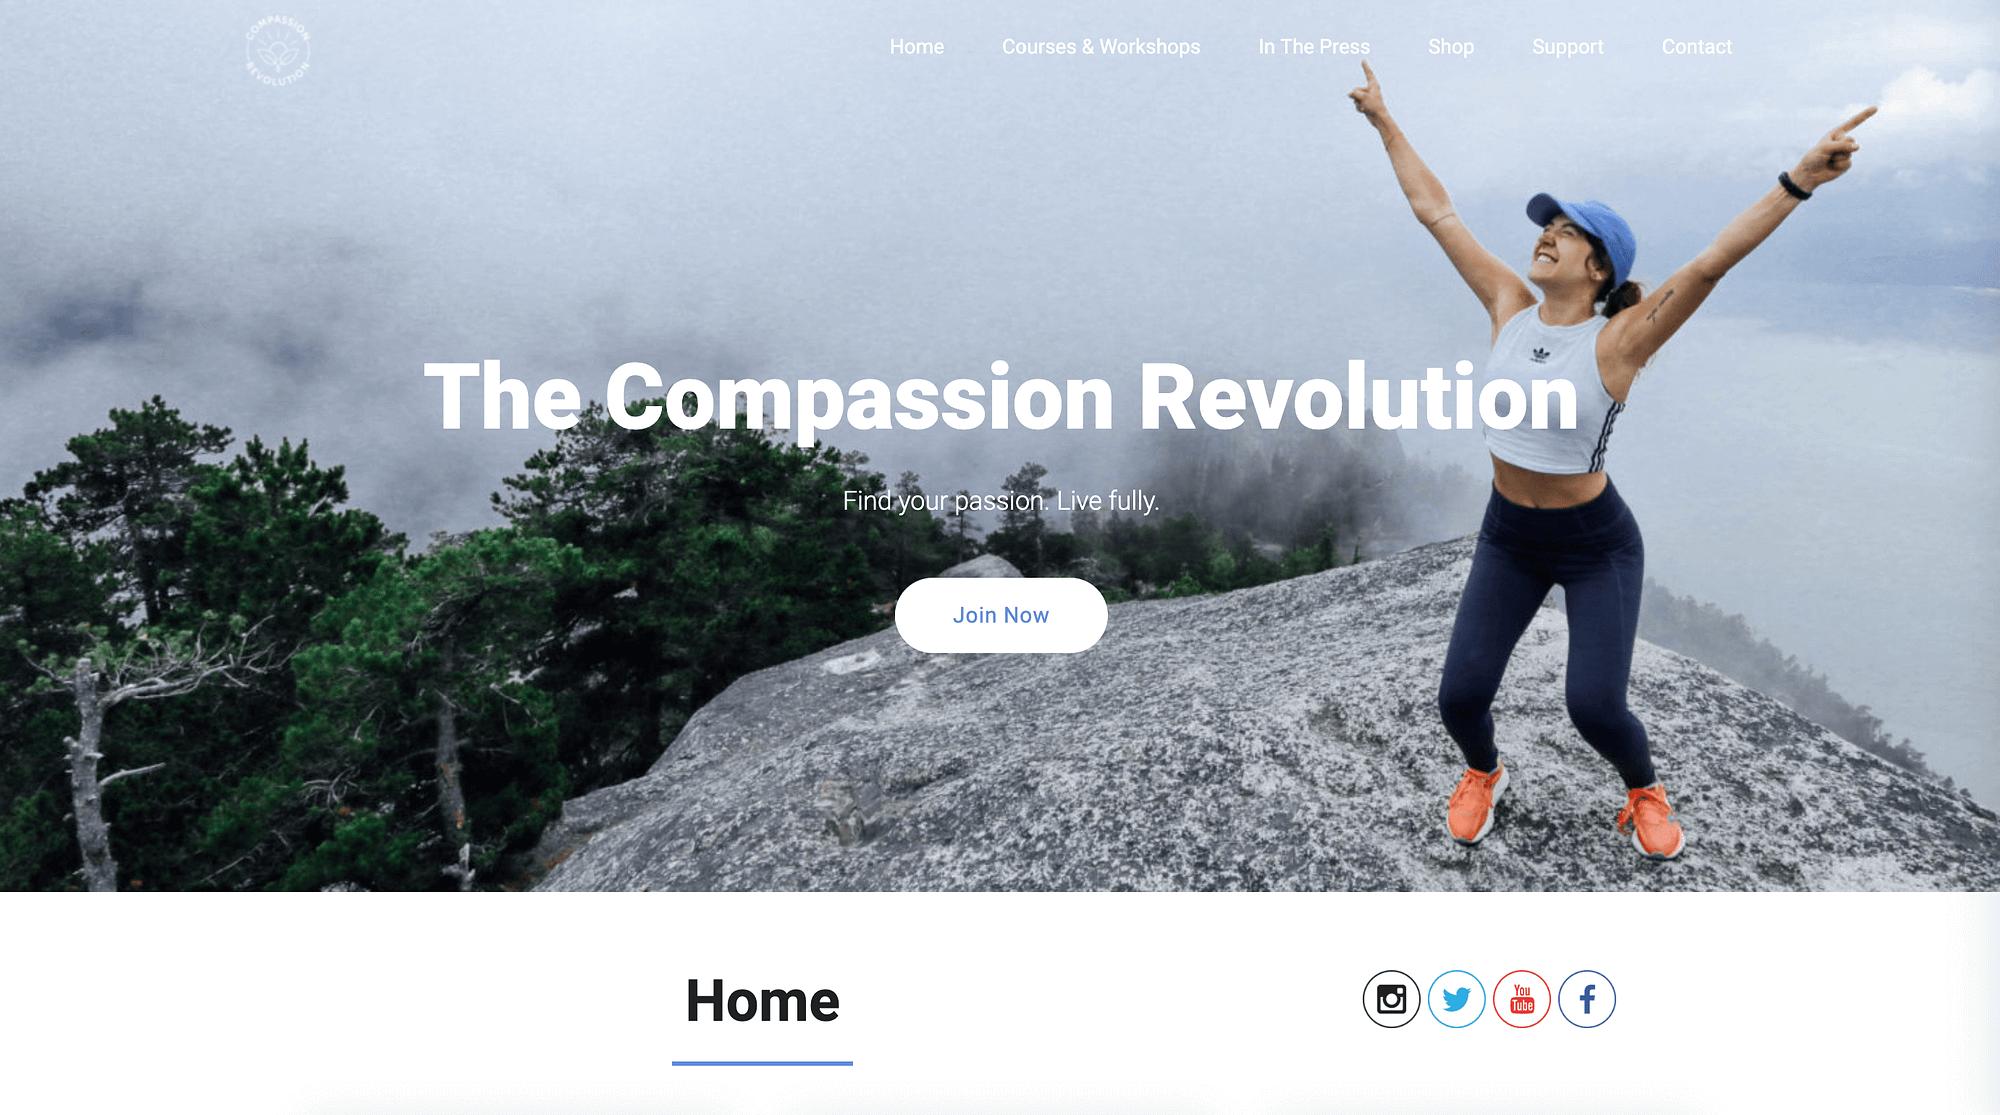 Your DIY website needs a CTA button